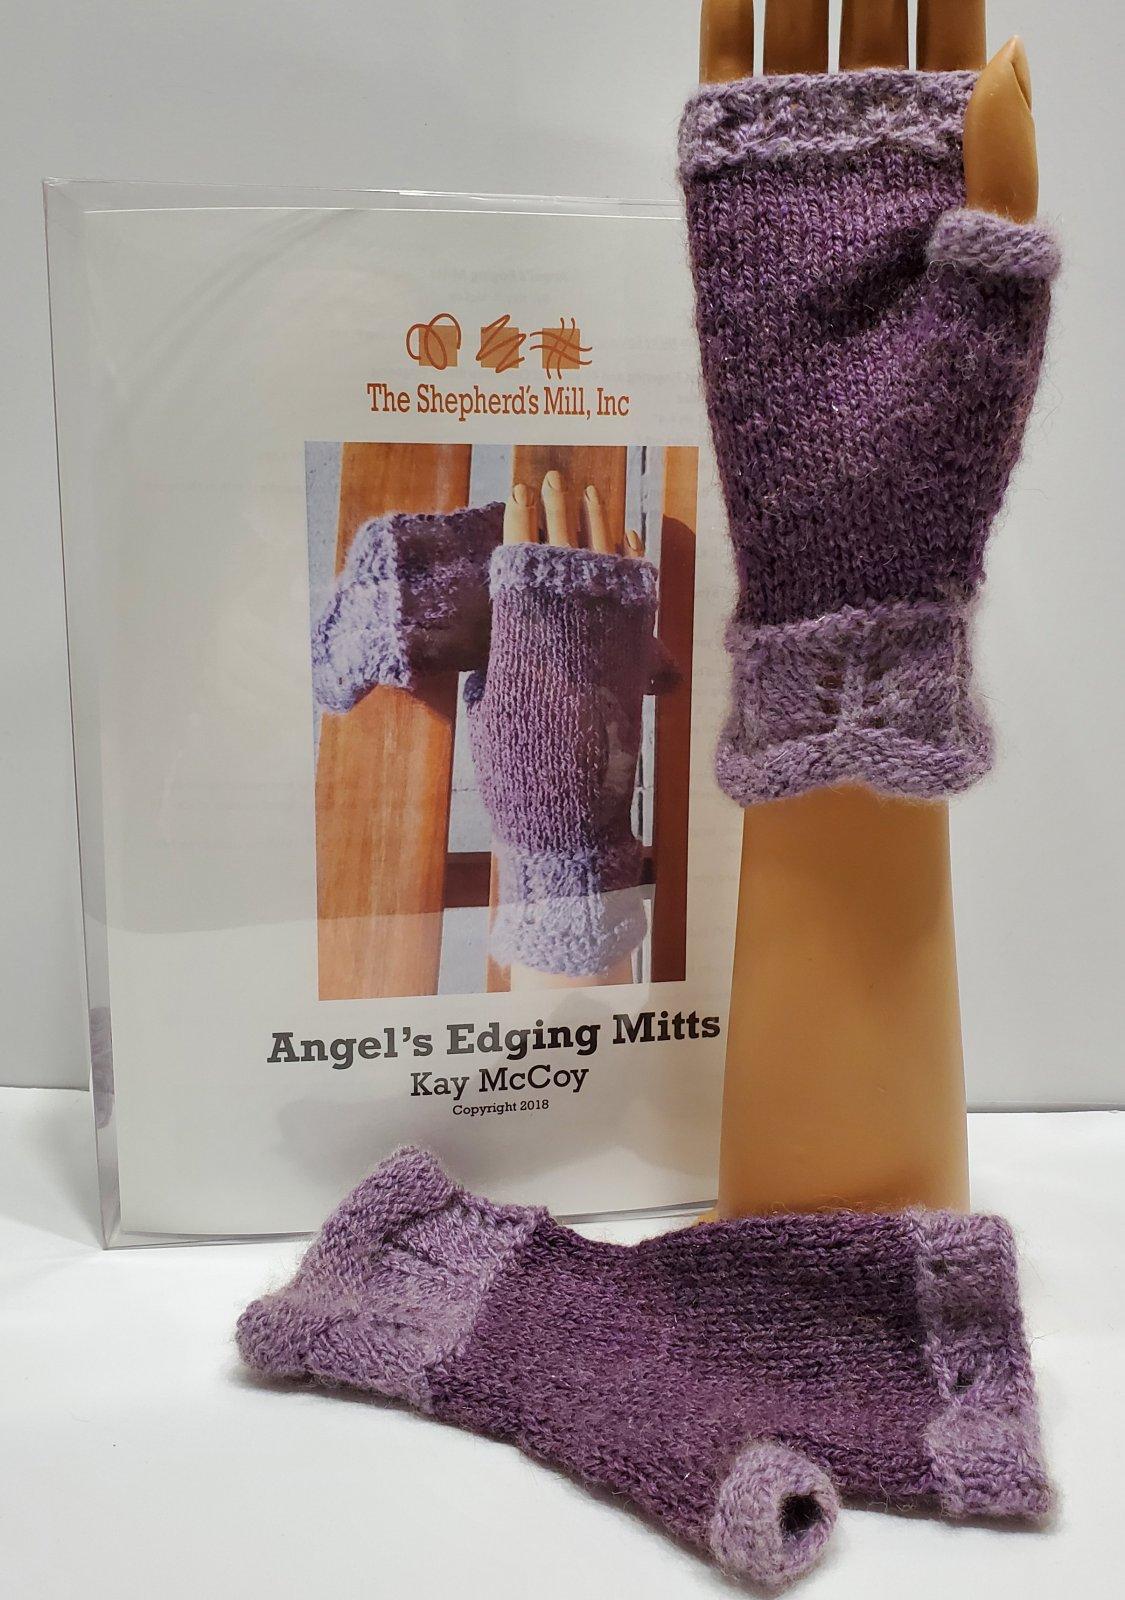 Angel's Edging Mitts Kit